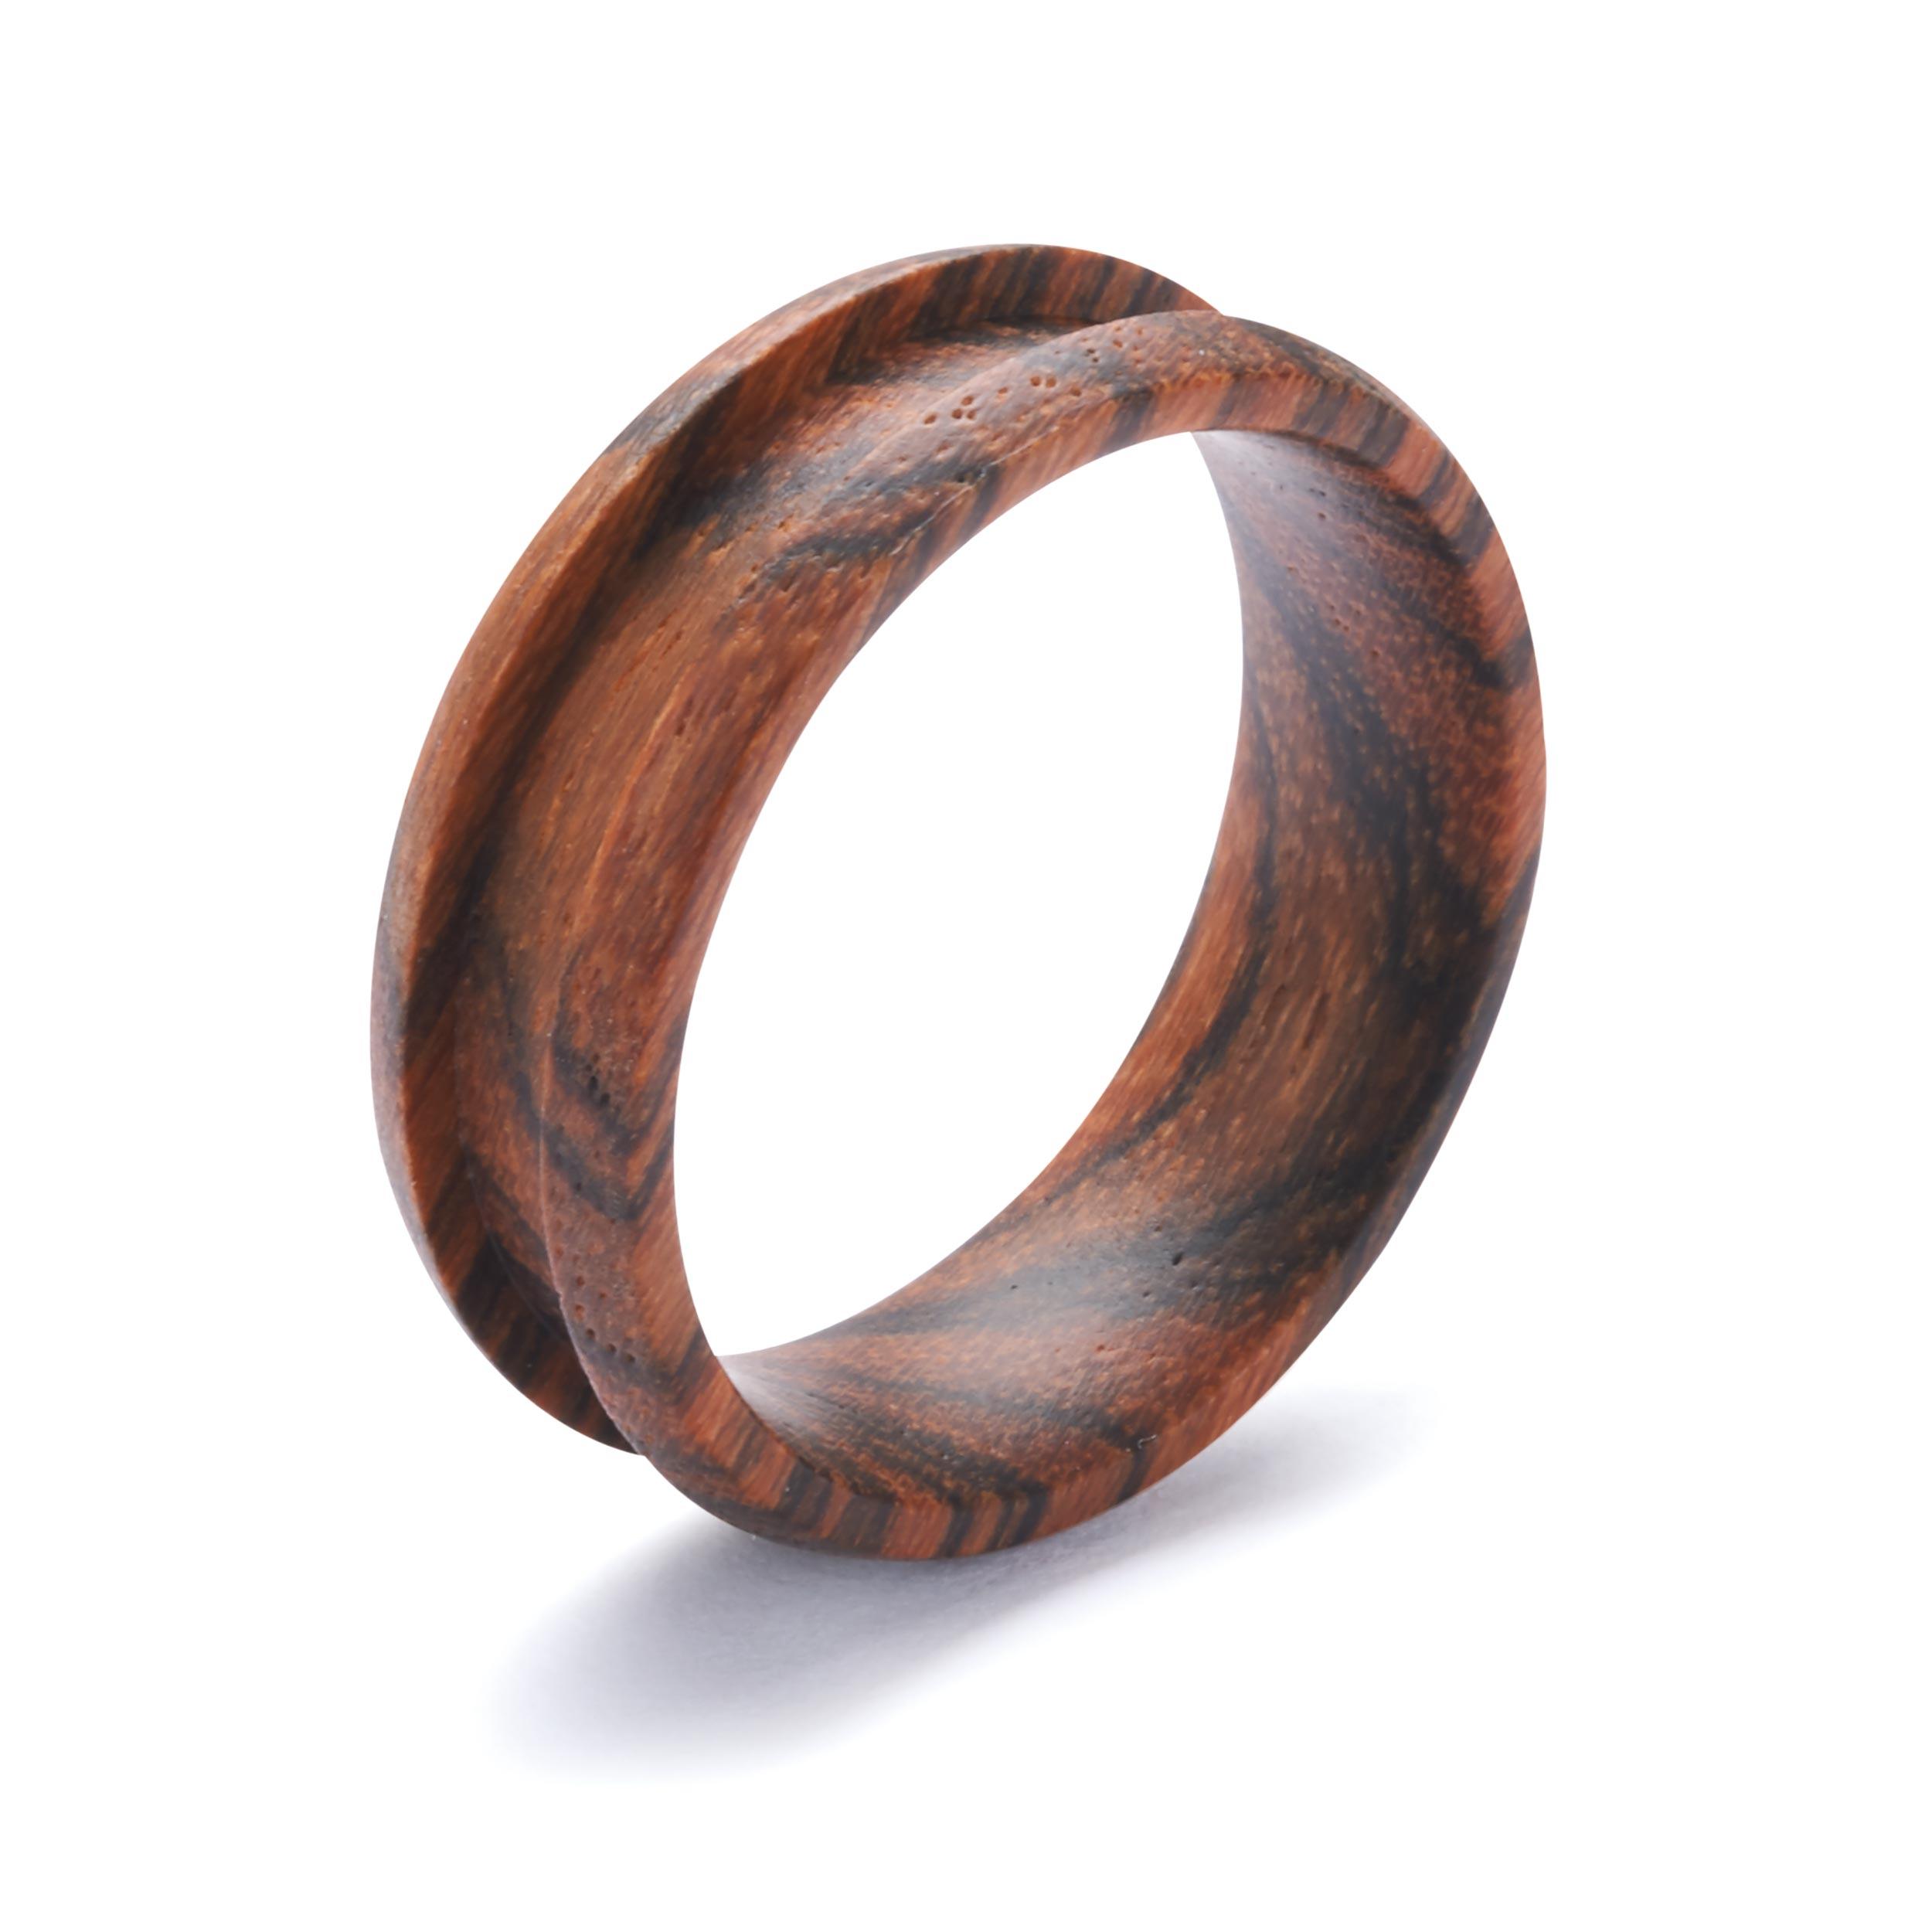 Comfort Ring Core - Bocote - 8mm, Size 12.5